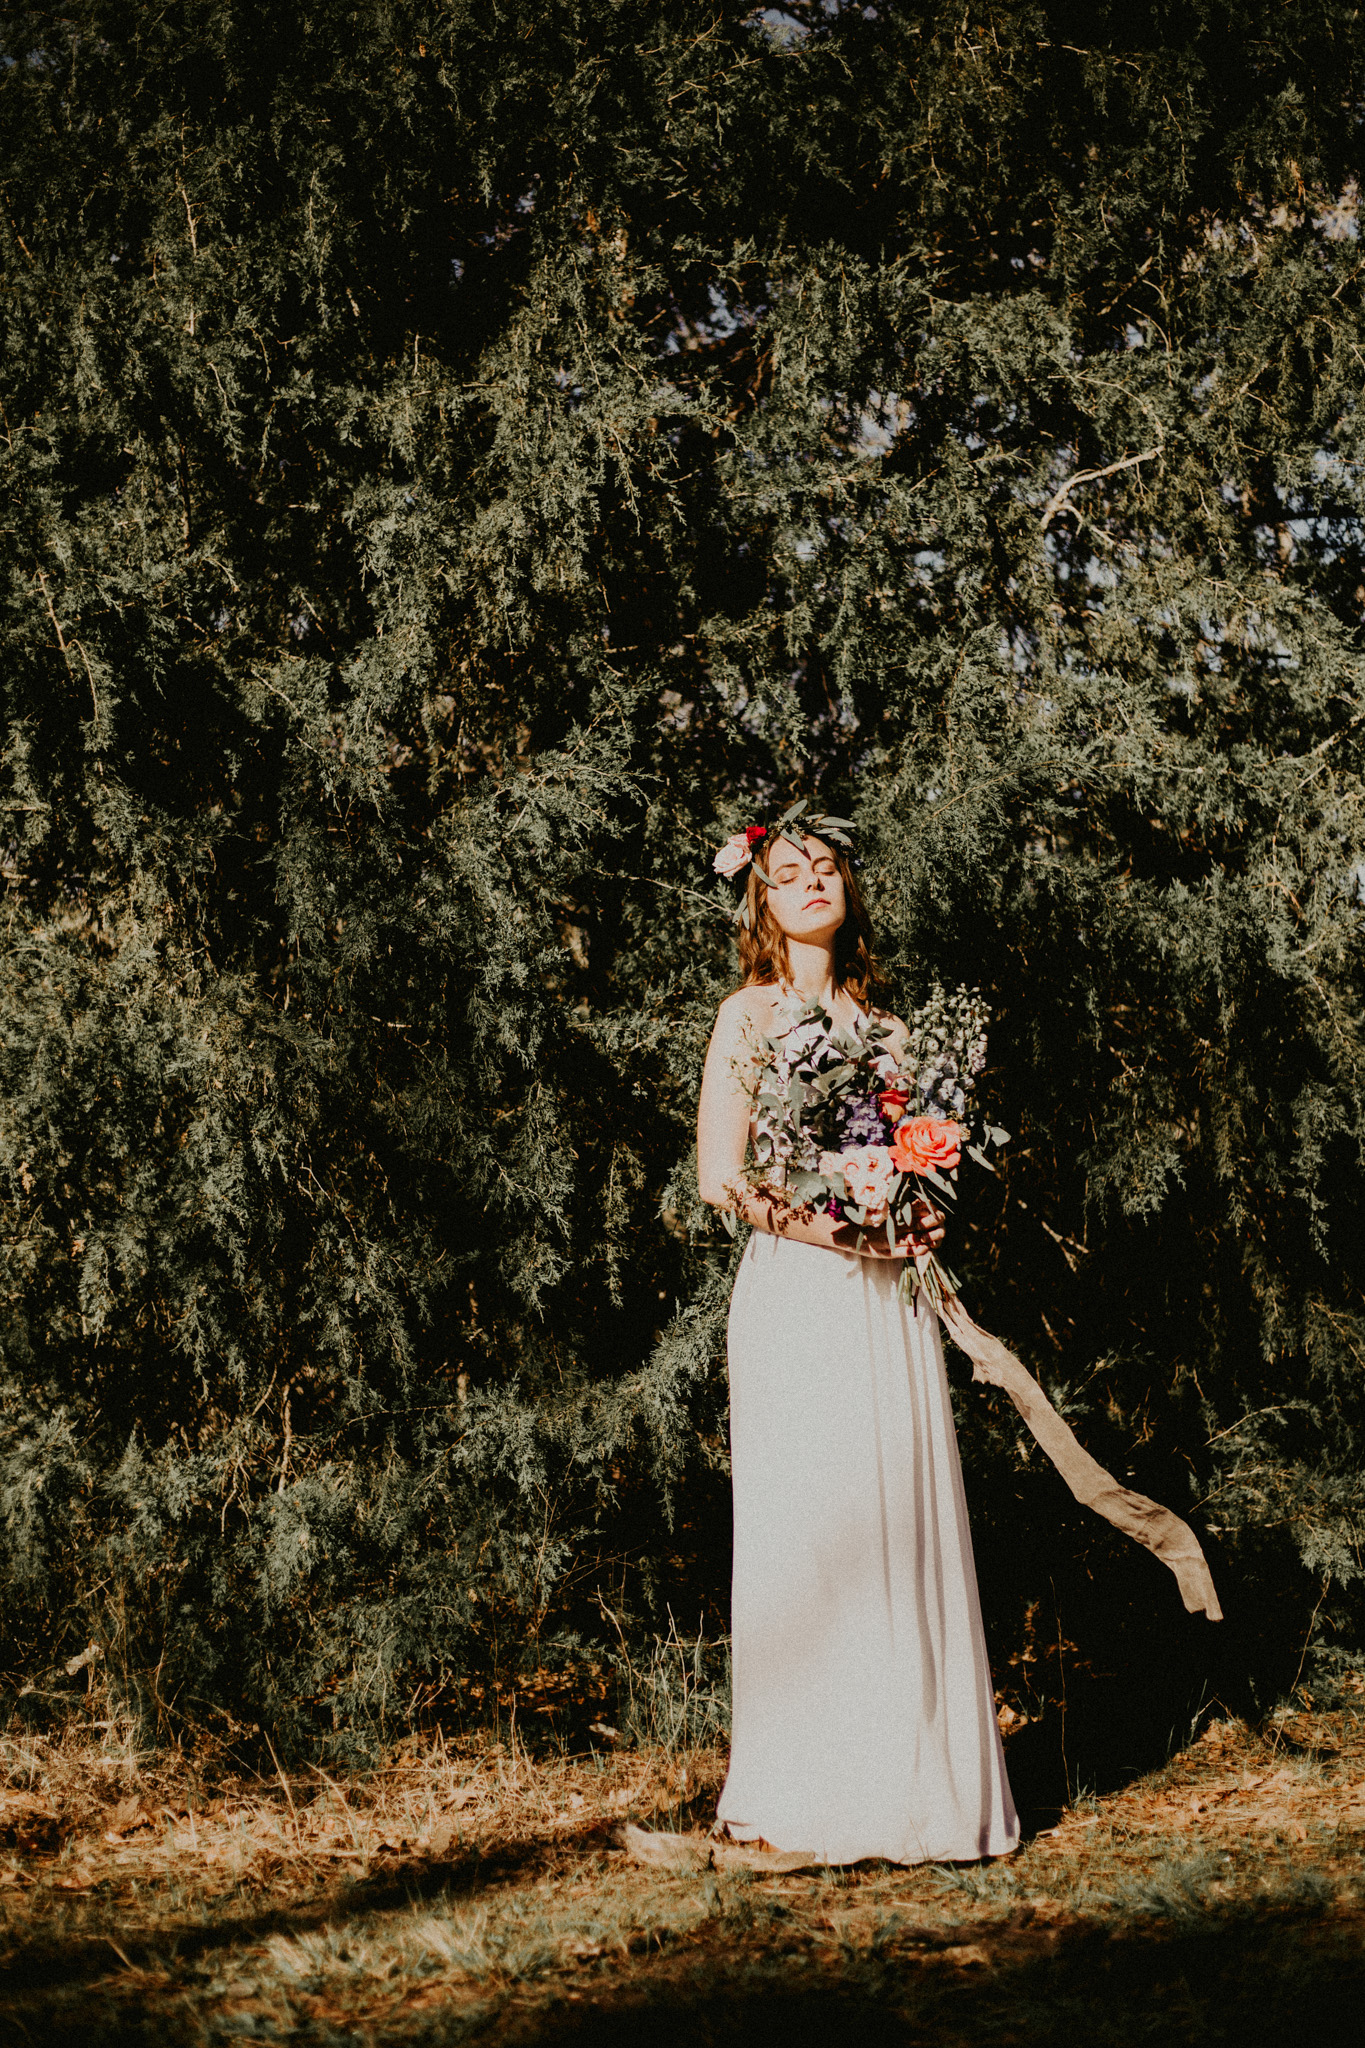 zoe bridals-14.jpg